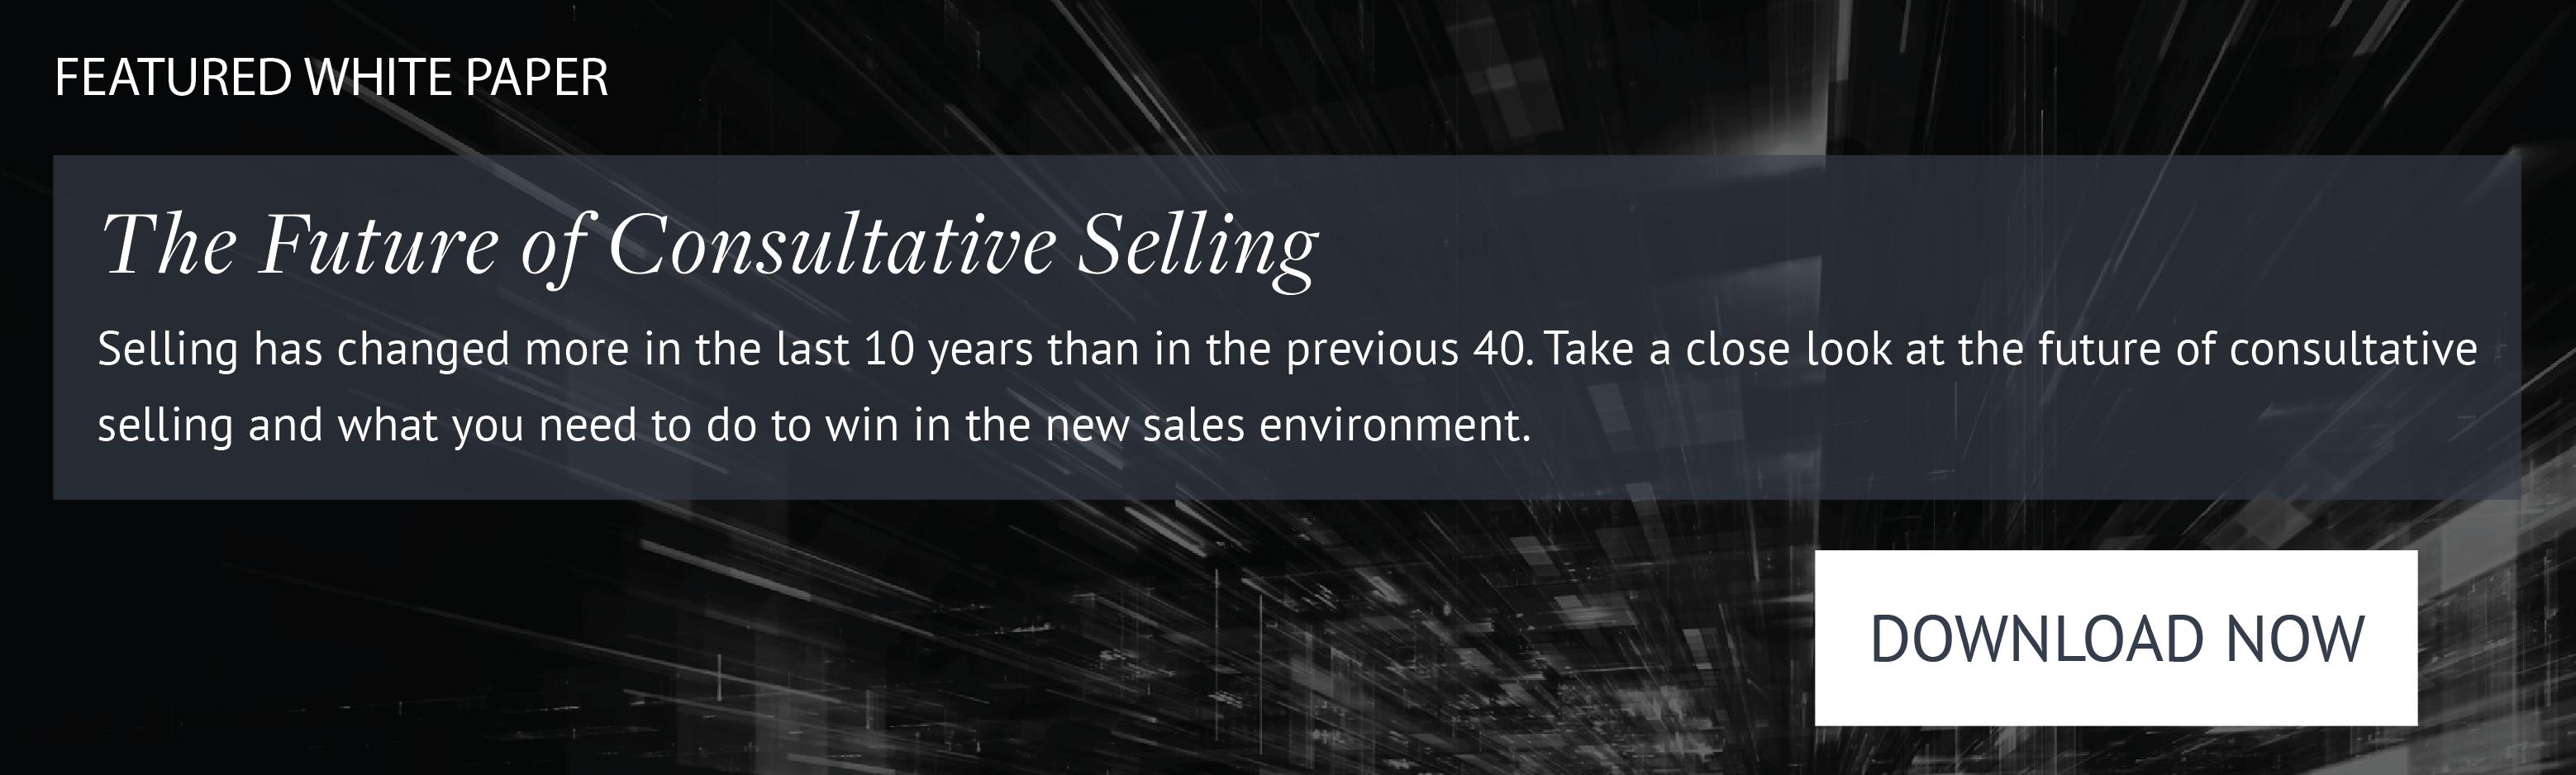 The Future of Consulative Selling white paper